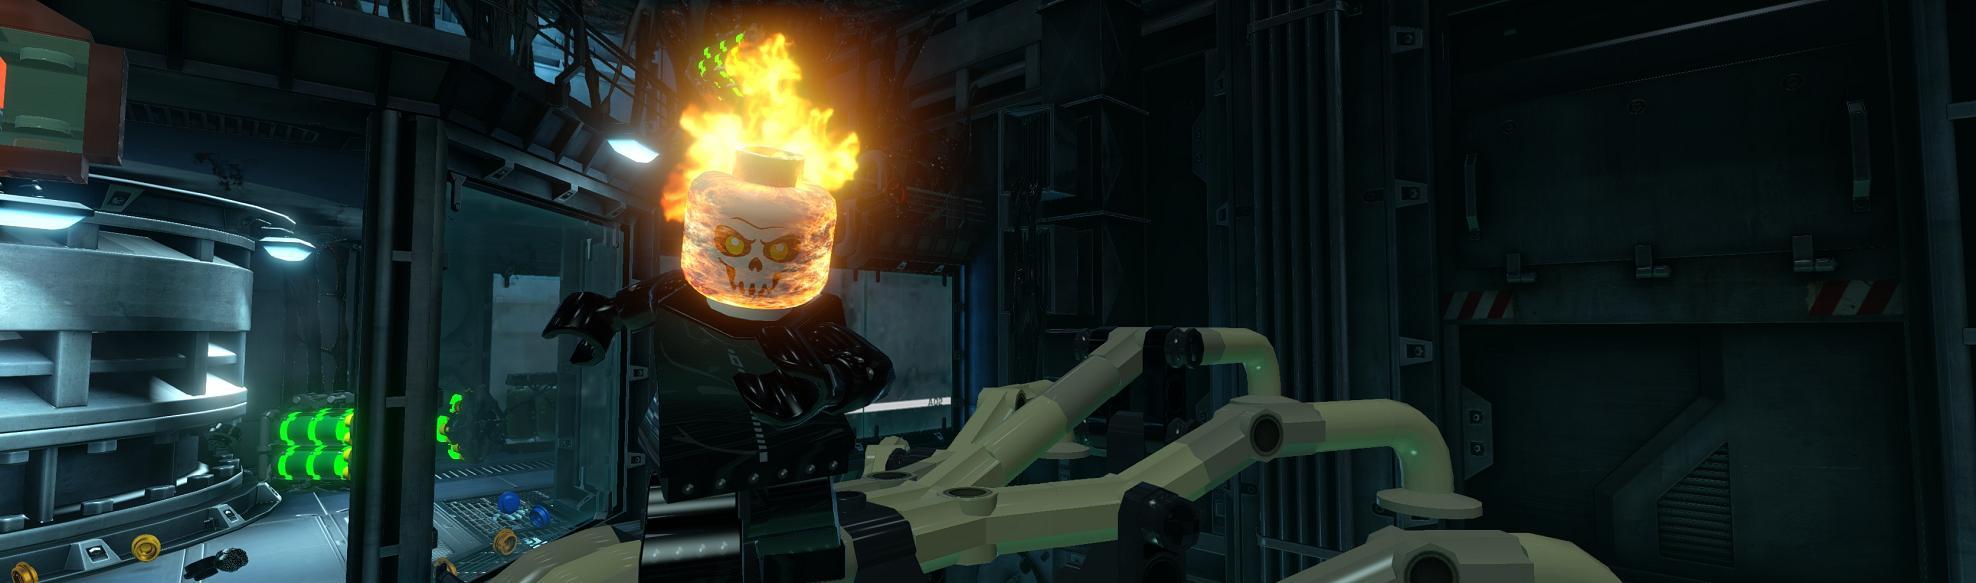 LEGO Marvel Super Heroes Gamescom Trailer